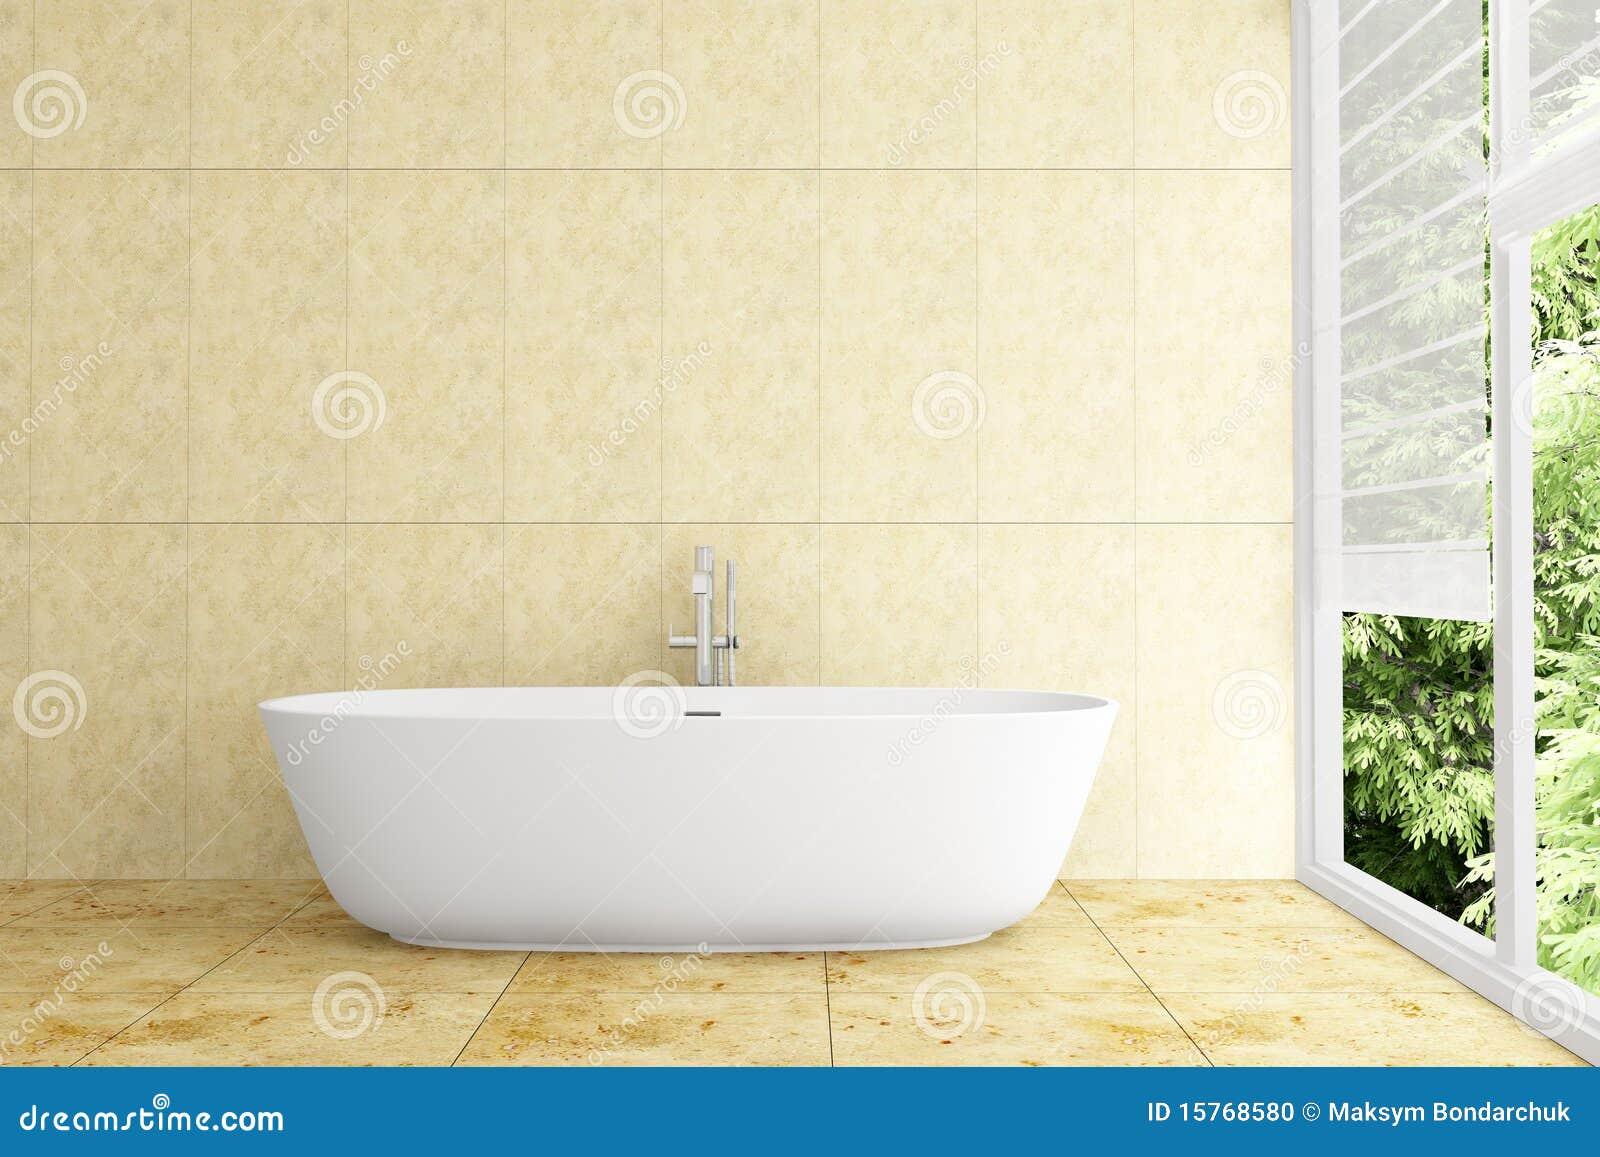 Modern Bathroom With Beige Tiles On Wall Stock Photo - Image: 15768580